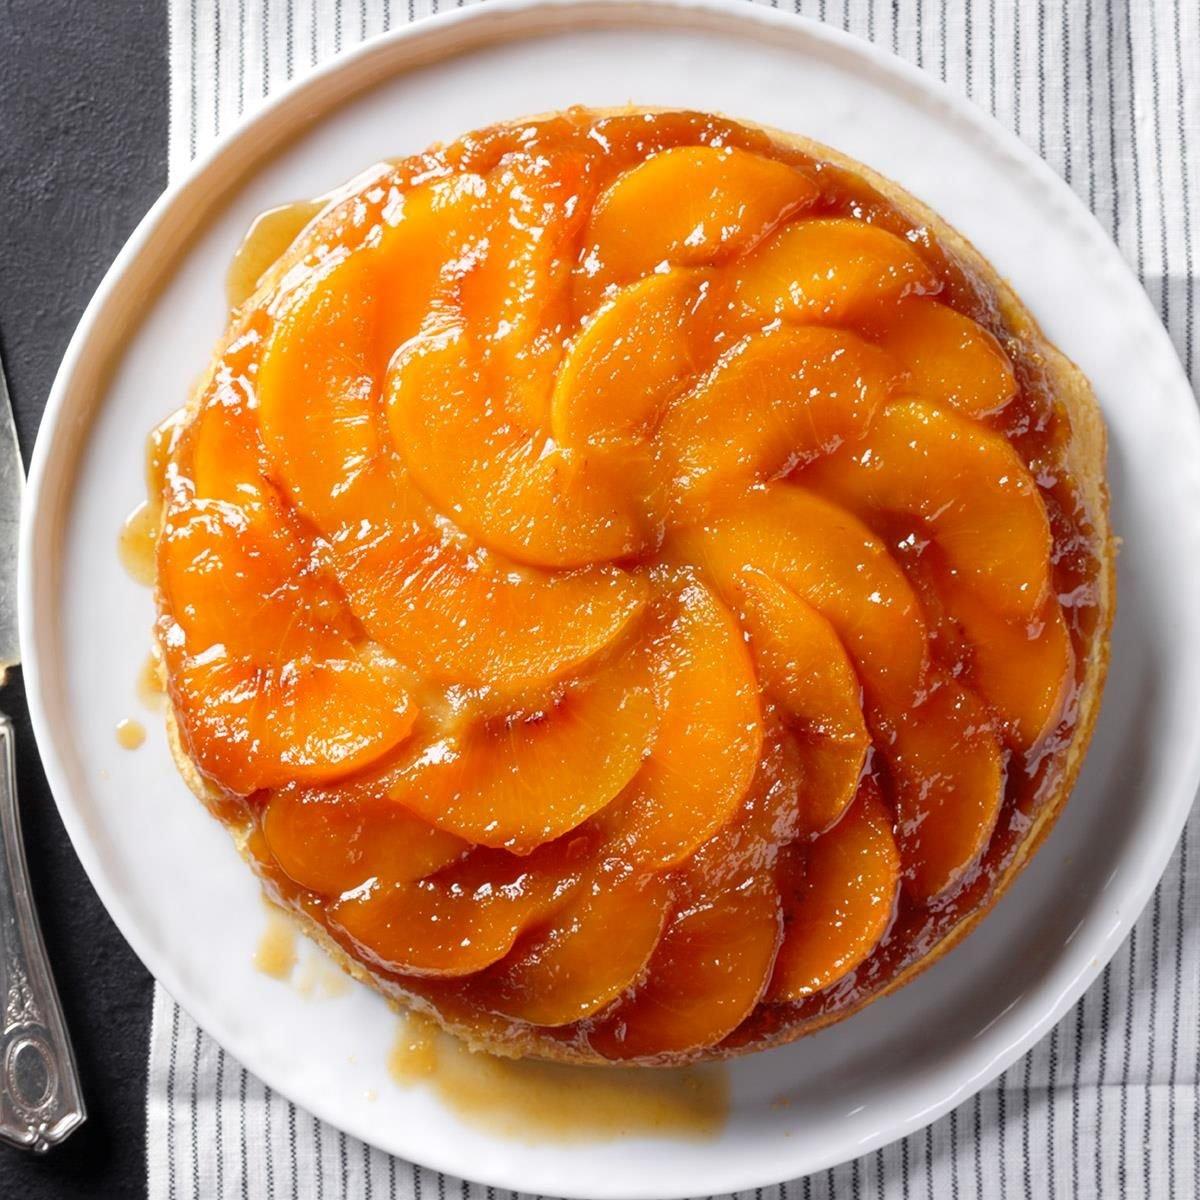 Southern Peach Upside-Down Cake